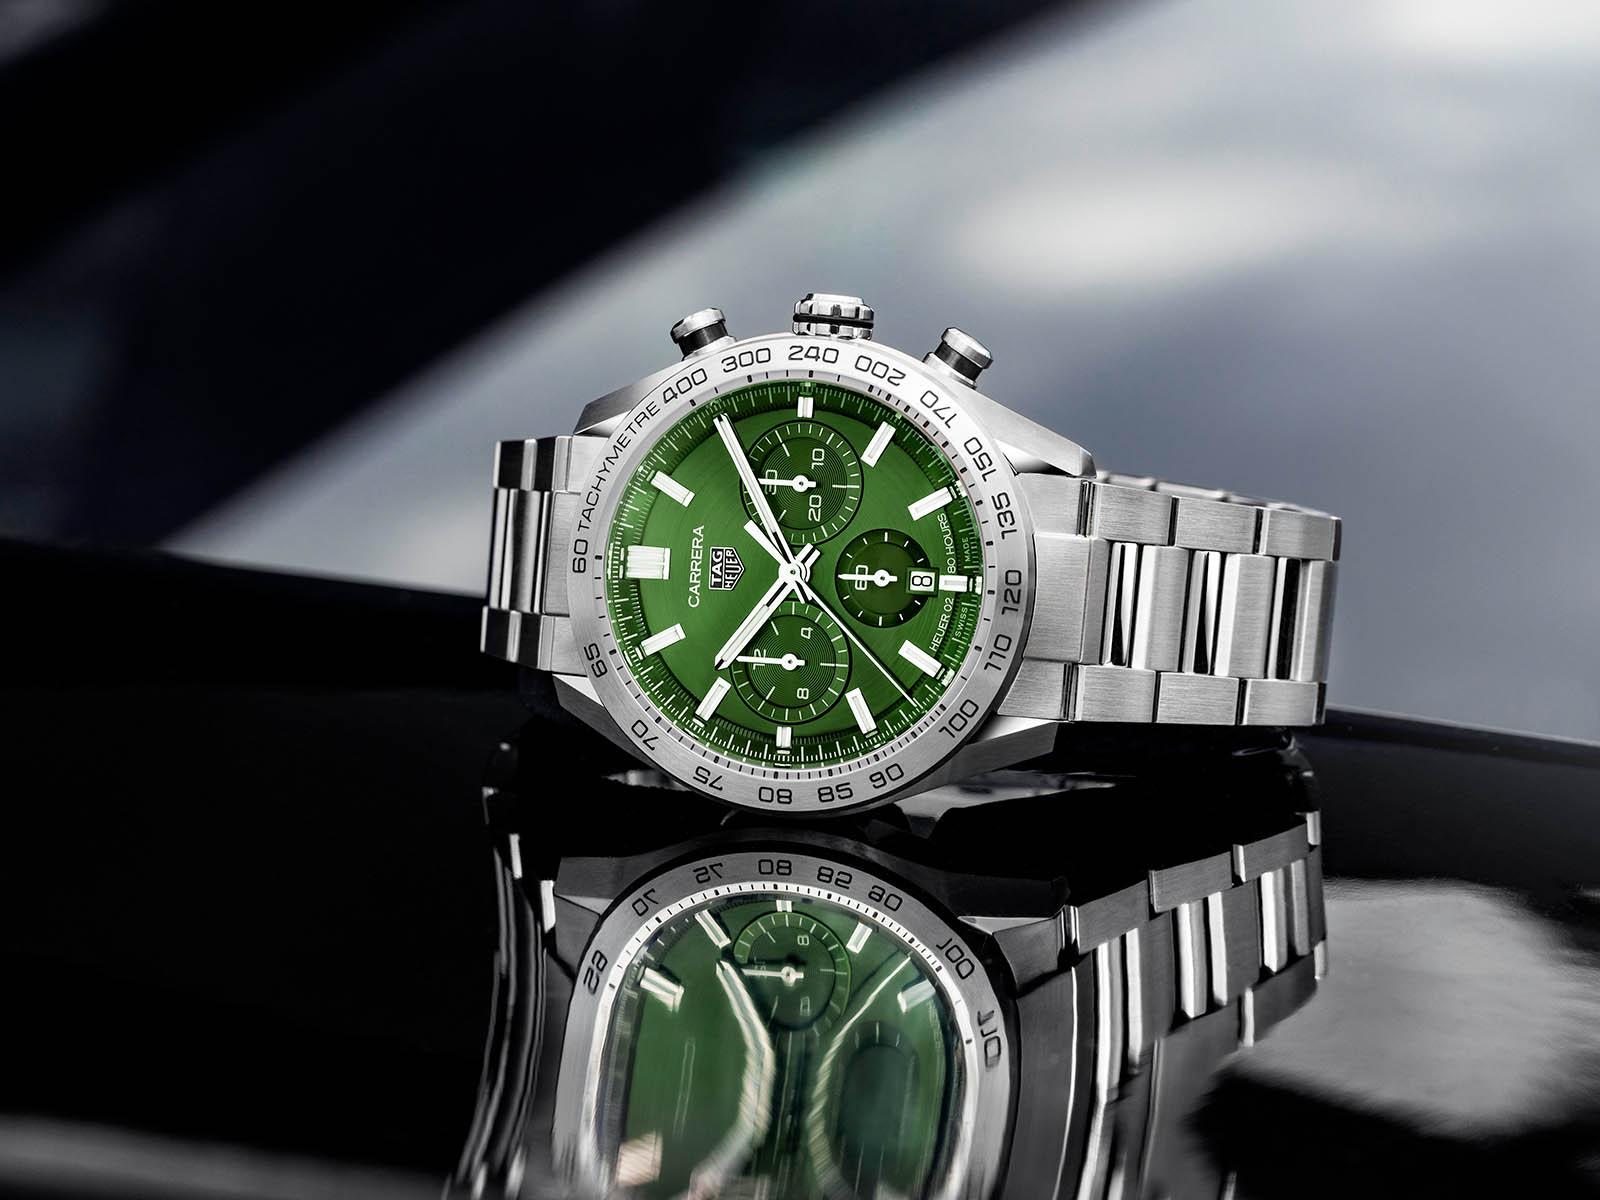 cbn2a10-ba0643-tag-heuer-carrera-sport-chronograph-44mm-calibre-heuer-02-automatic-2.jpg